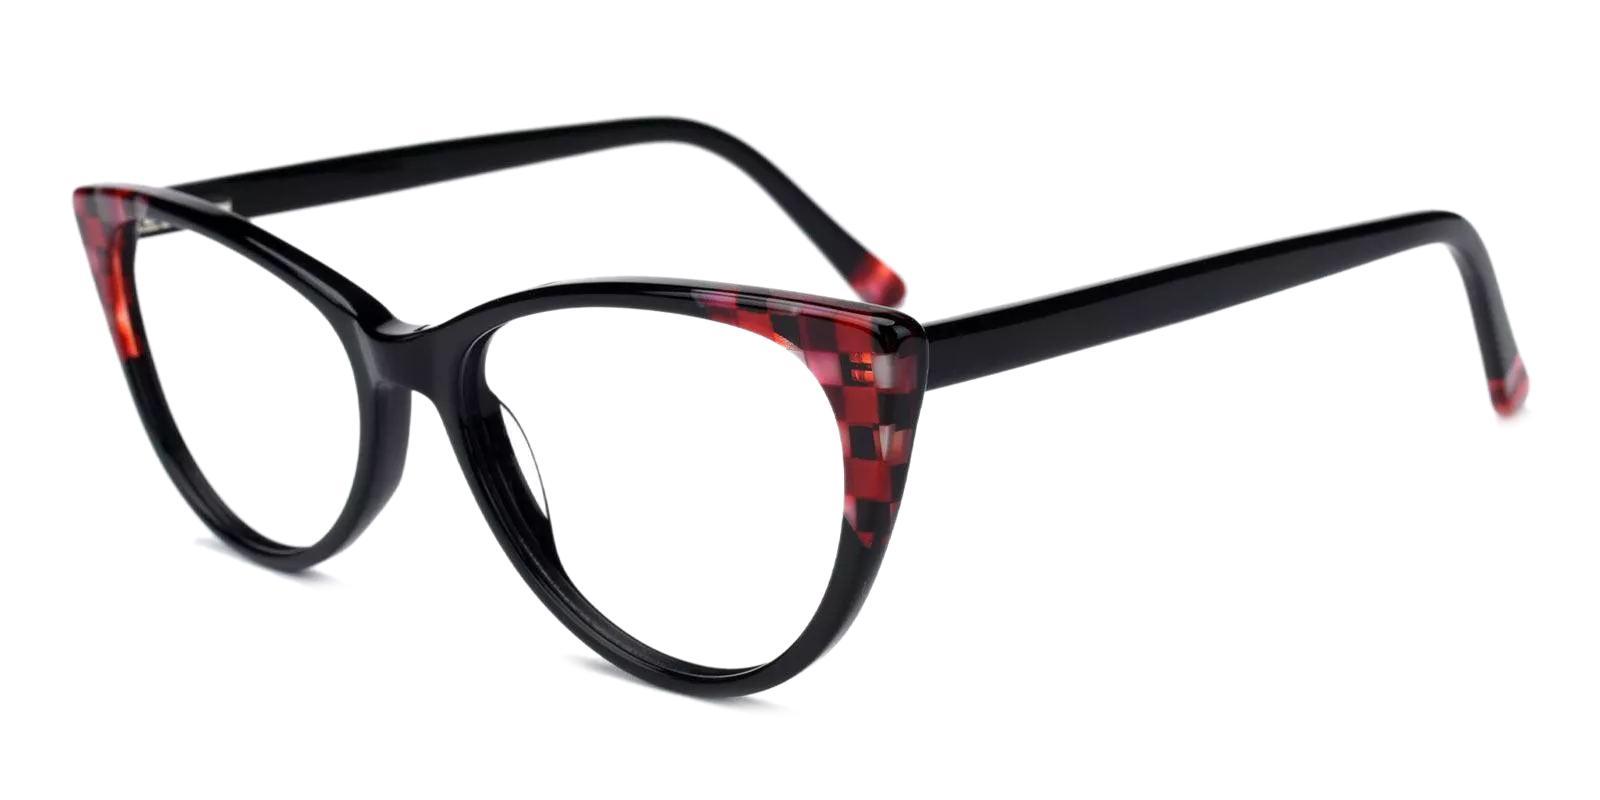 Reily Black Acetate Eyeglasses , Fashion , SpringHinges , UniversalBridgeFit Frames from ABBE Glasses